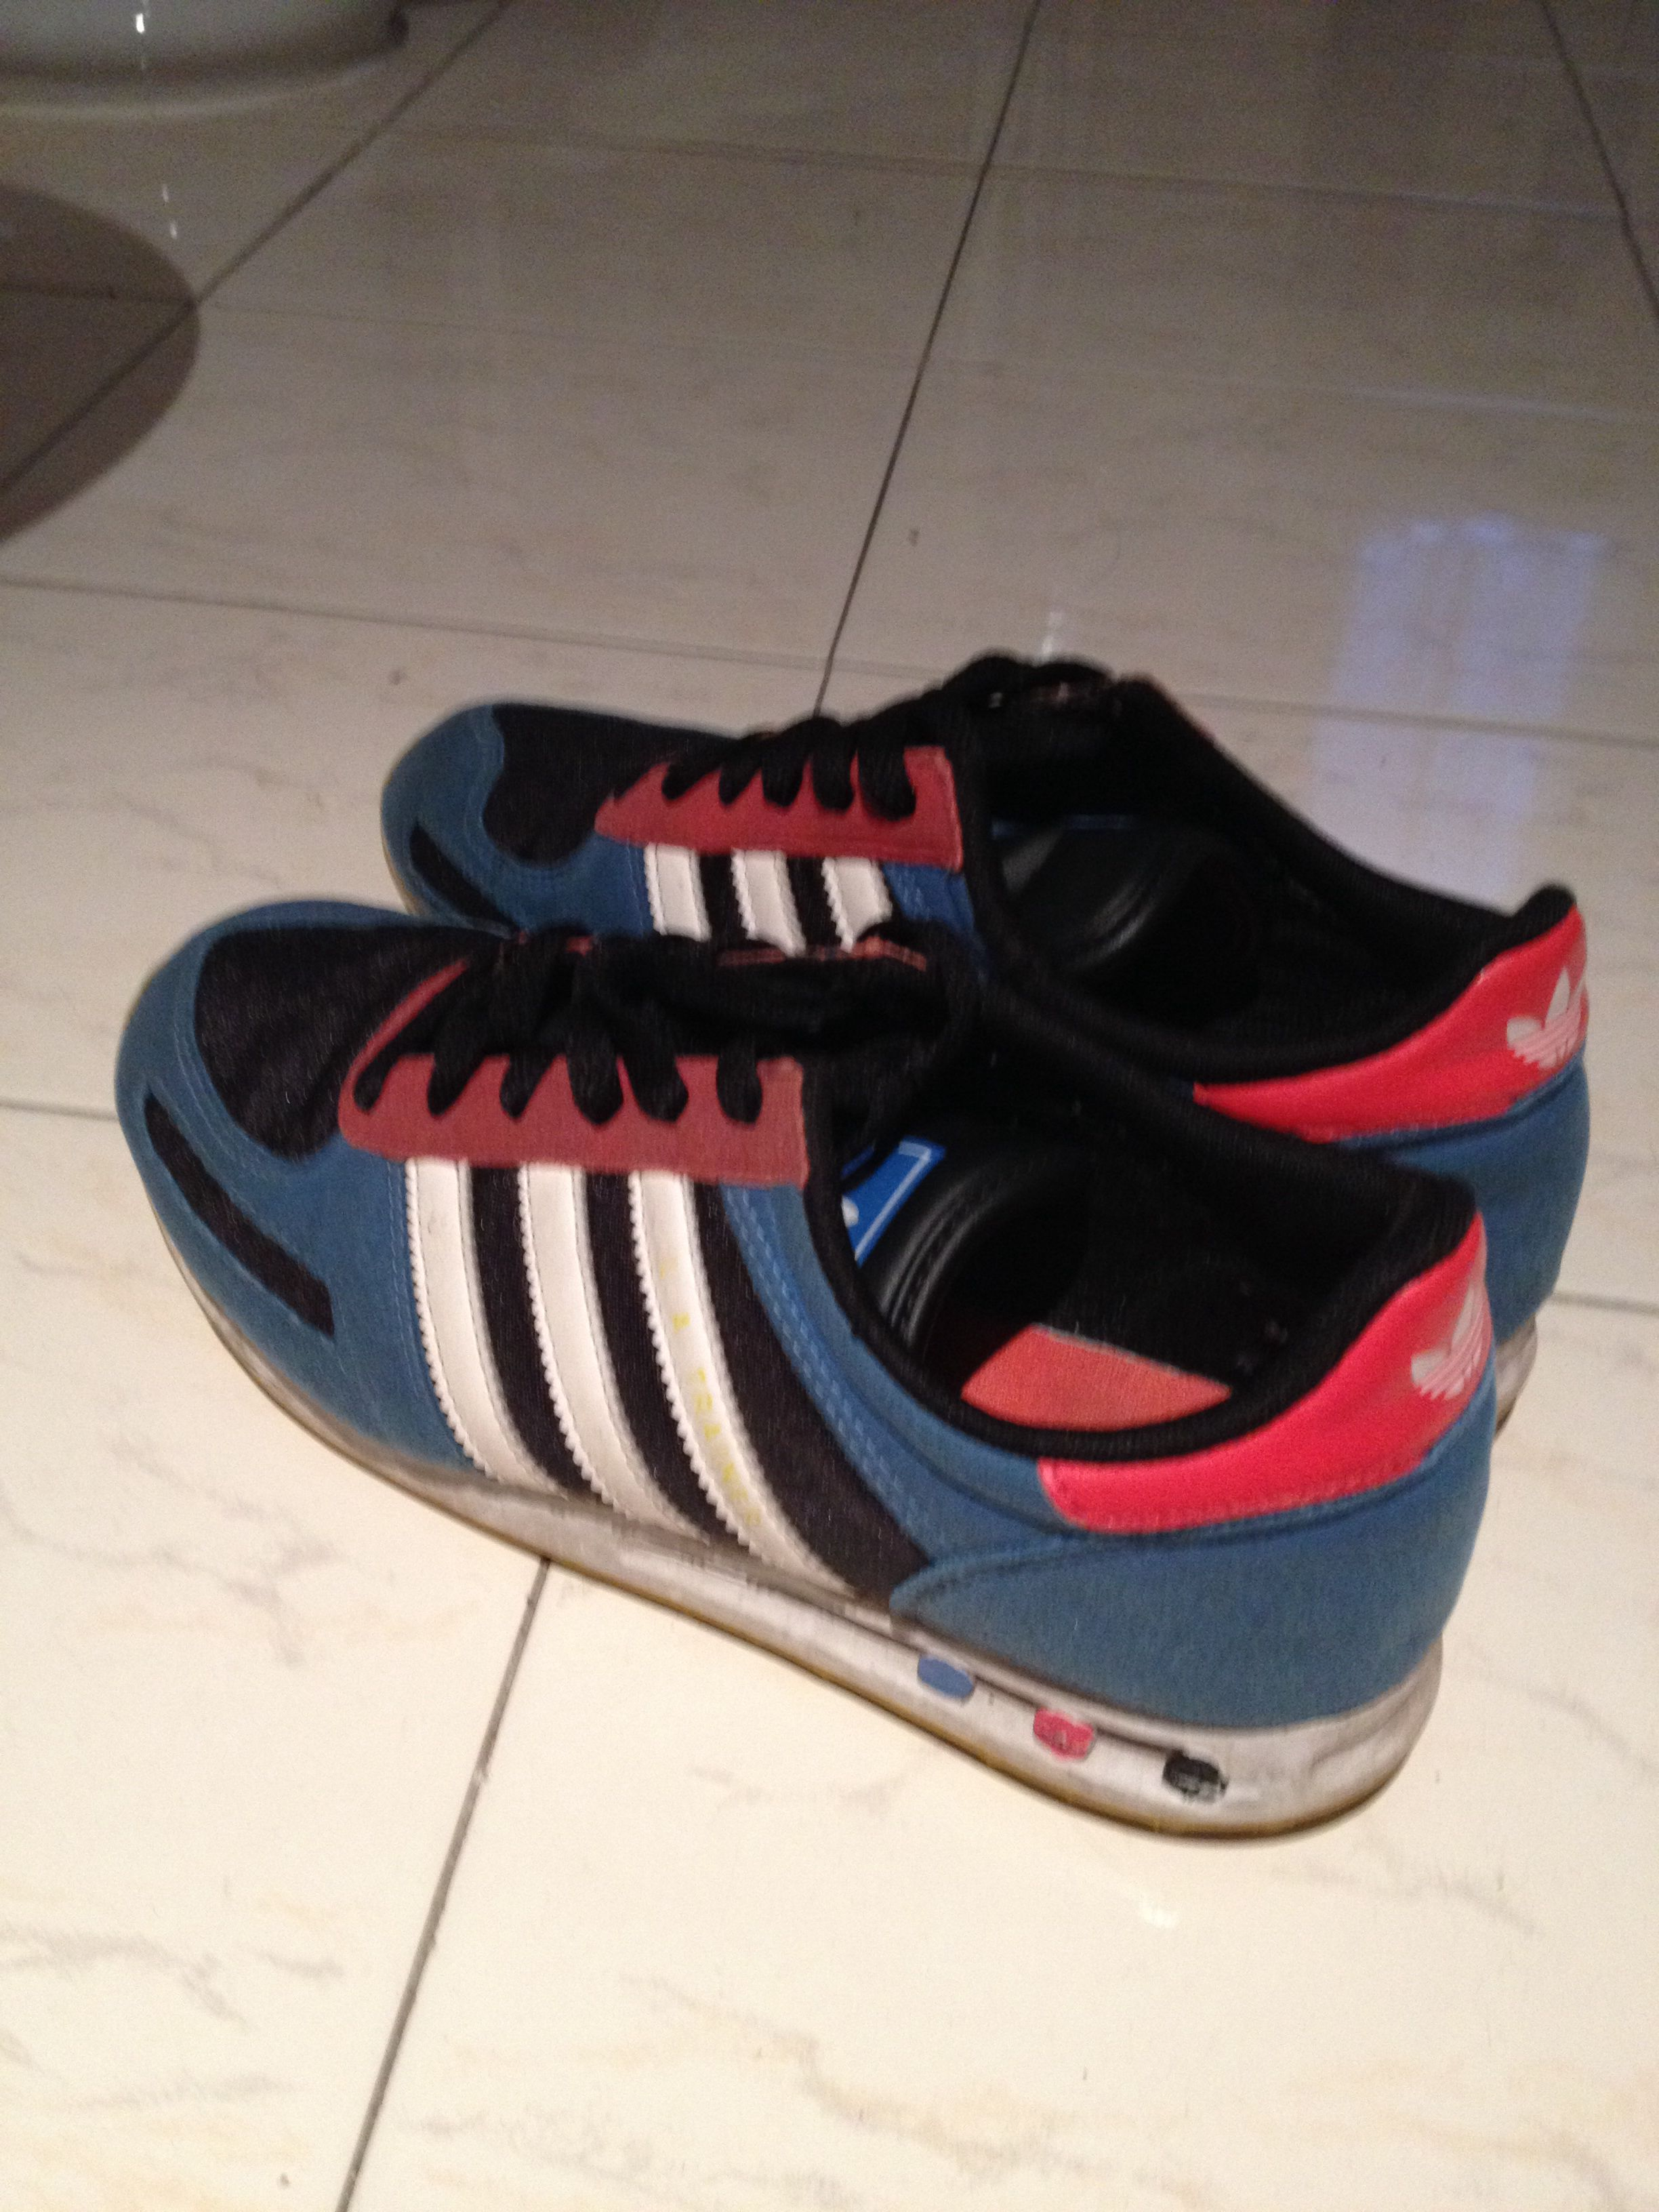 scarpe adidas per palestra